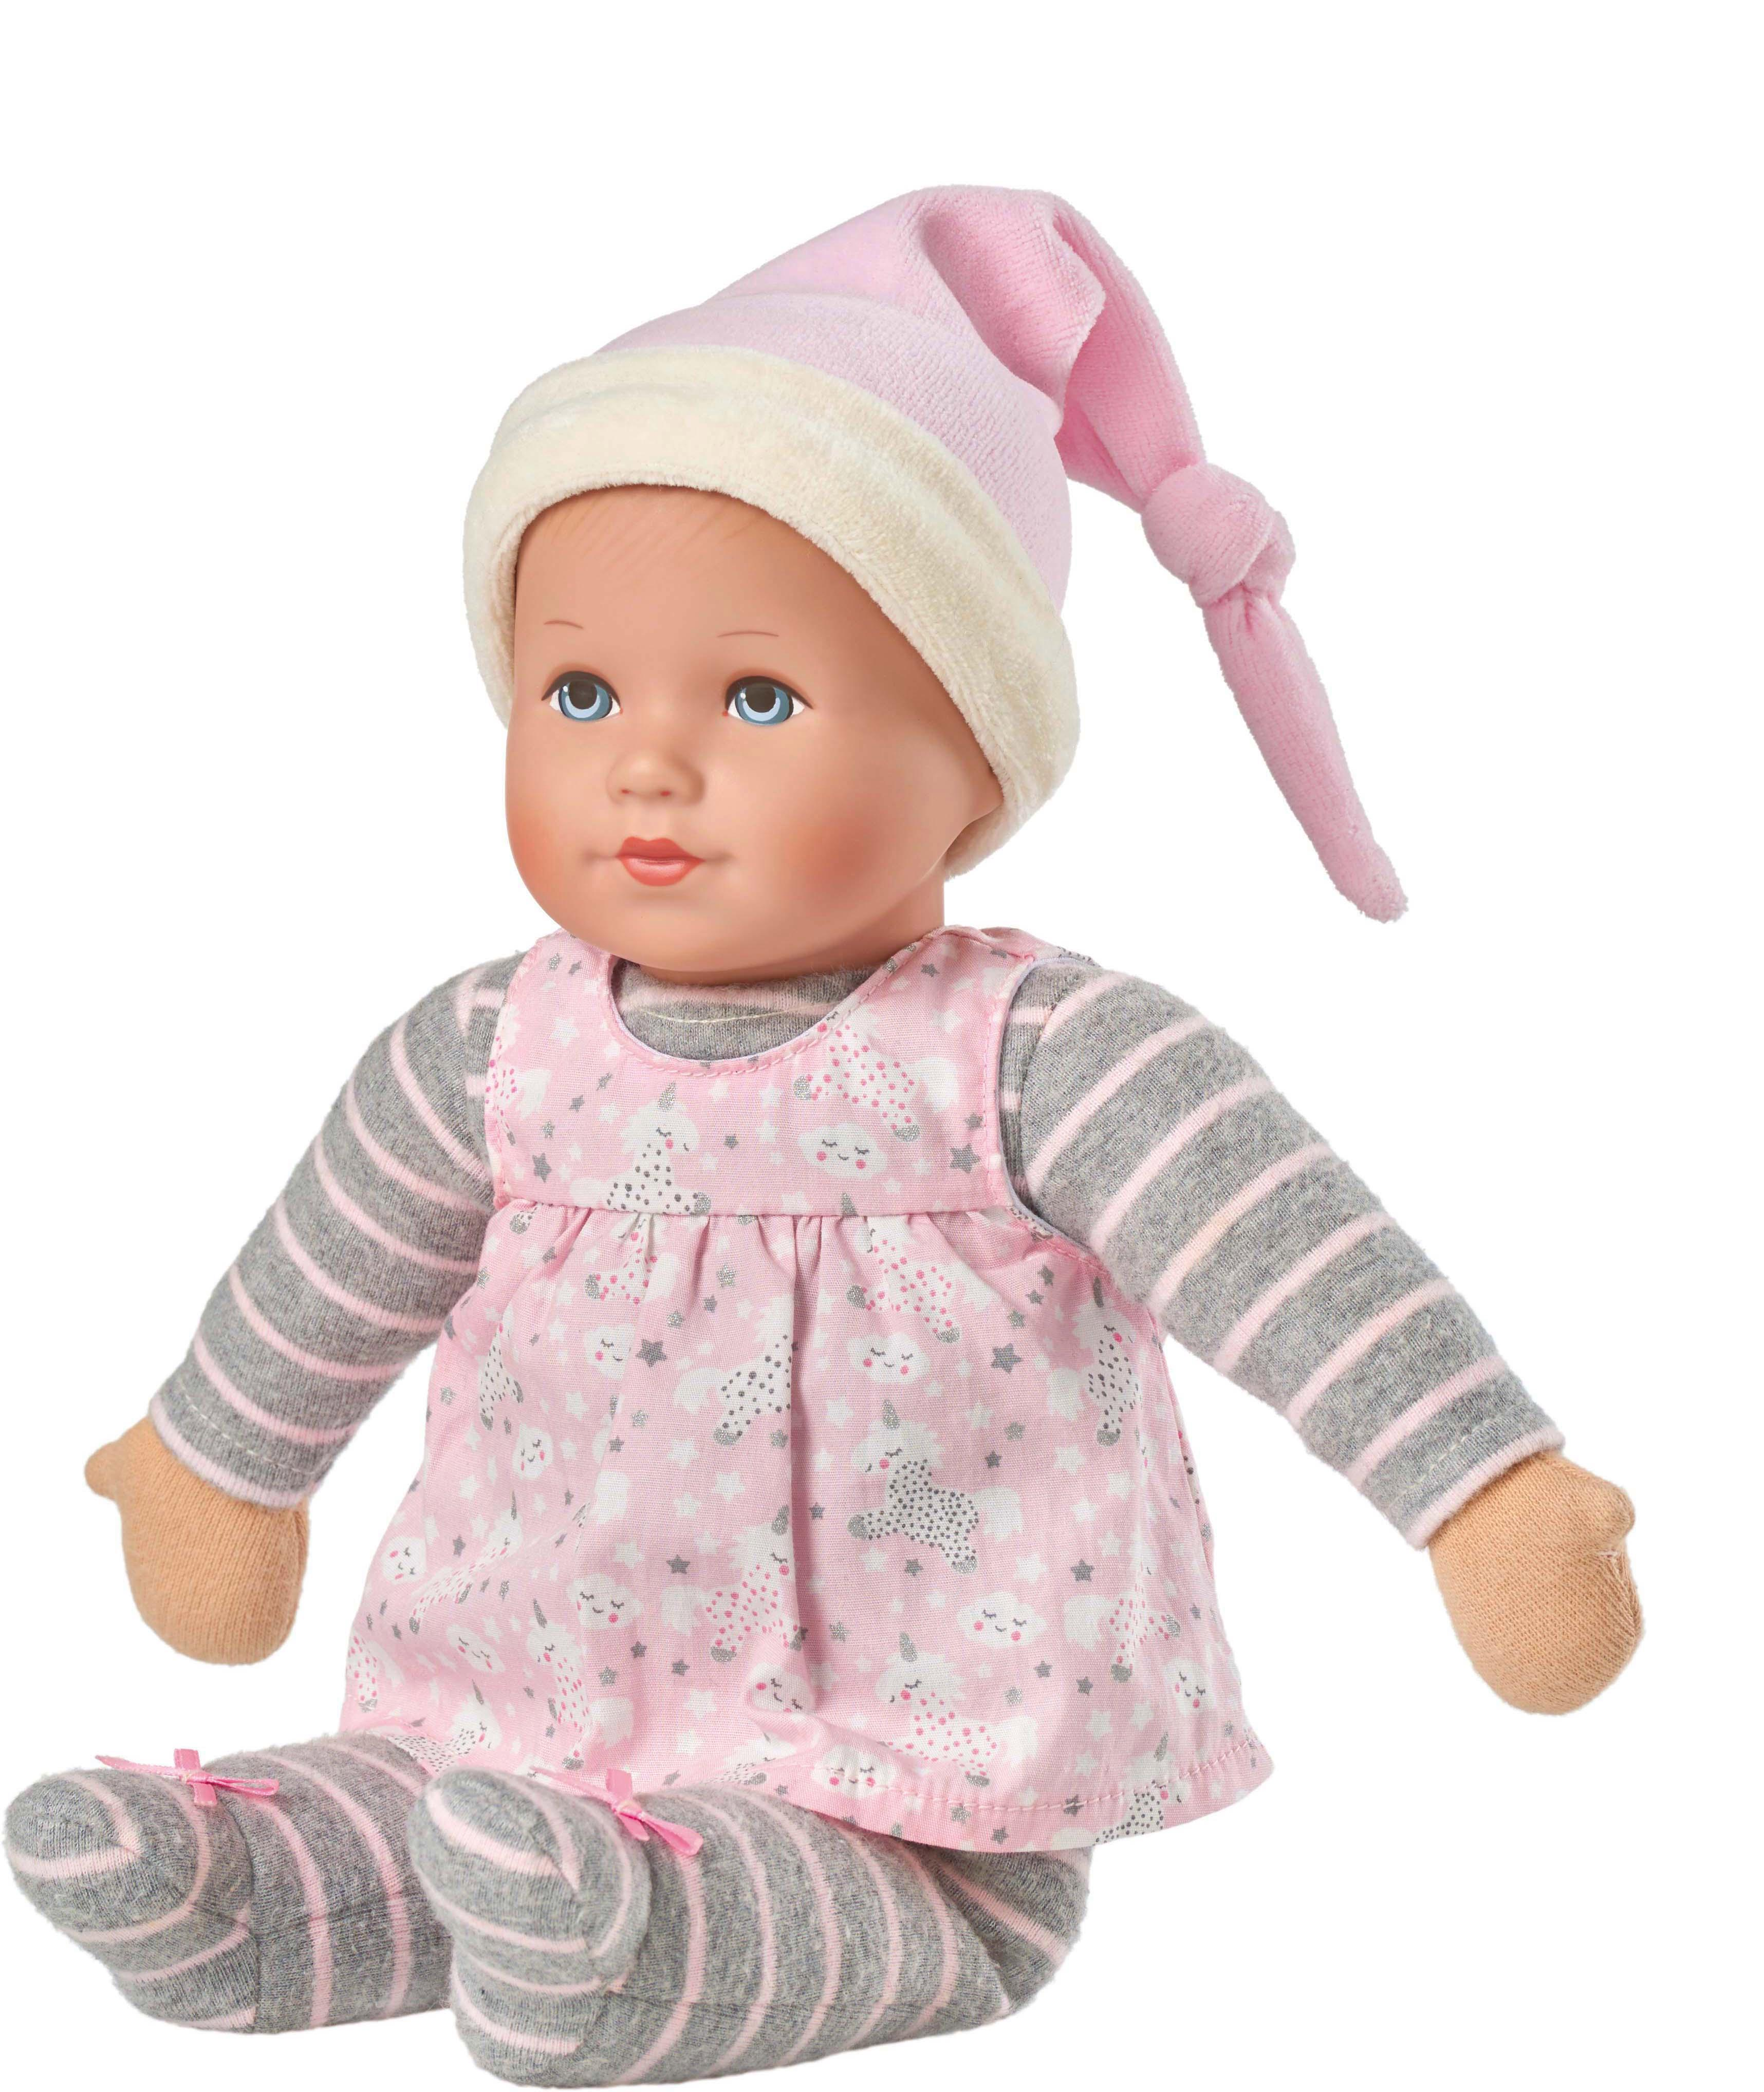 "Käthe Kruse Stoffpuppe ""Puppa Jule"" (1-tlg) Kindermode/Spielzeug/Puppen/Weitere Puppen"